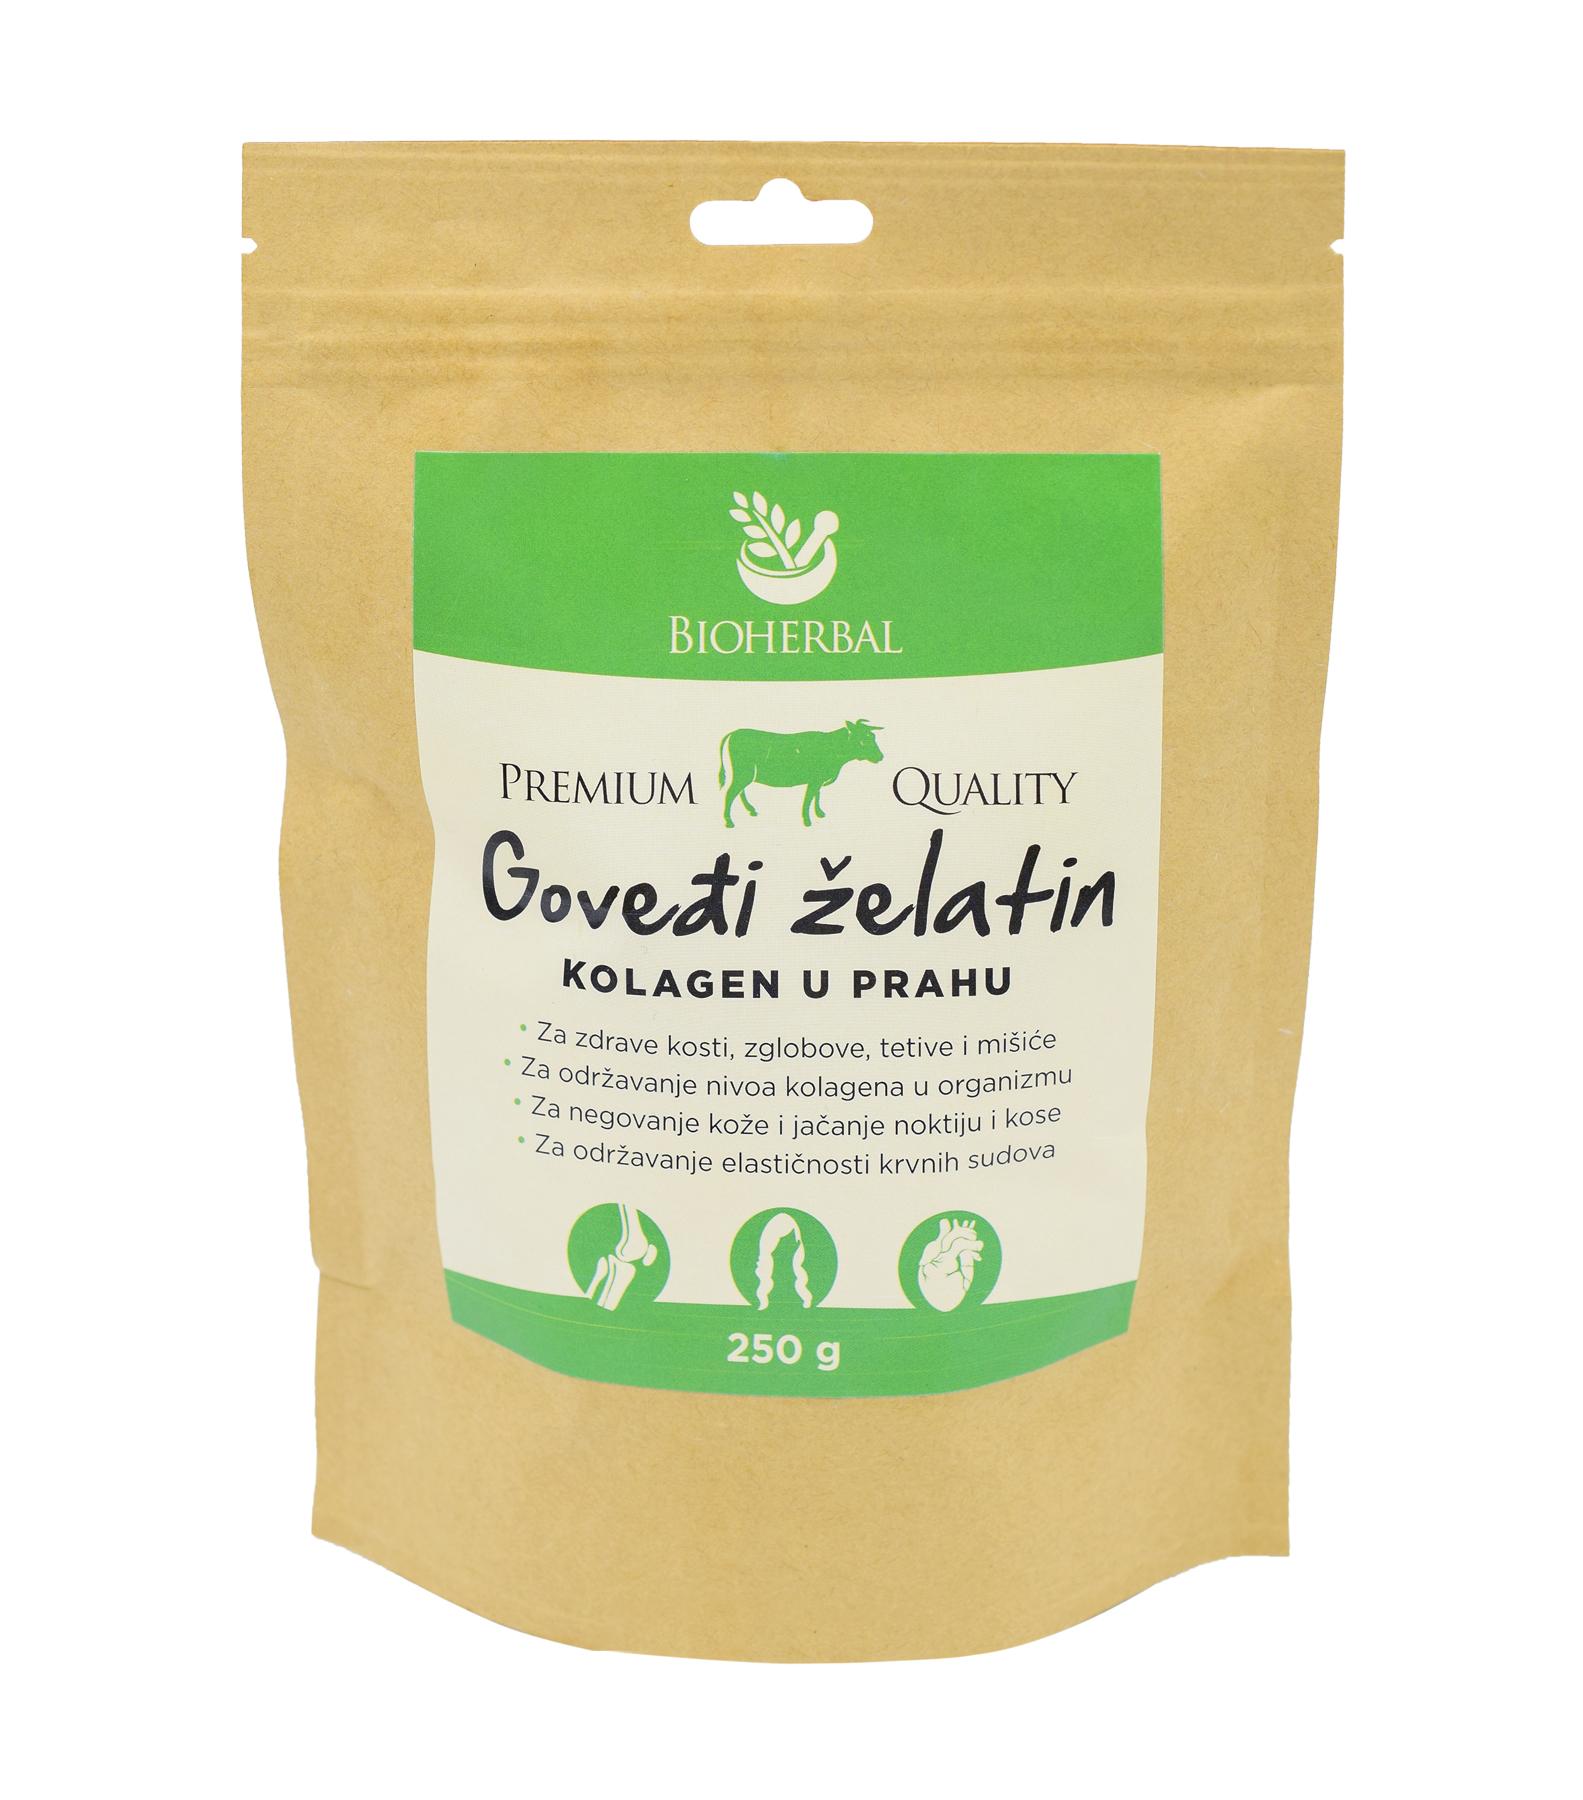 zdrava hrana govedji zelatin